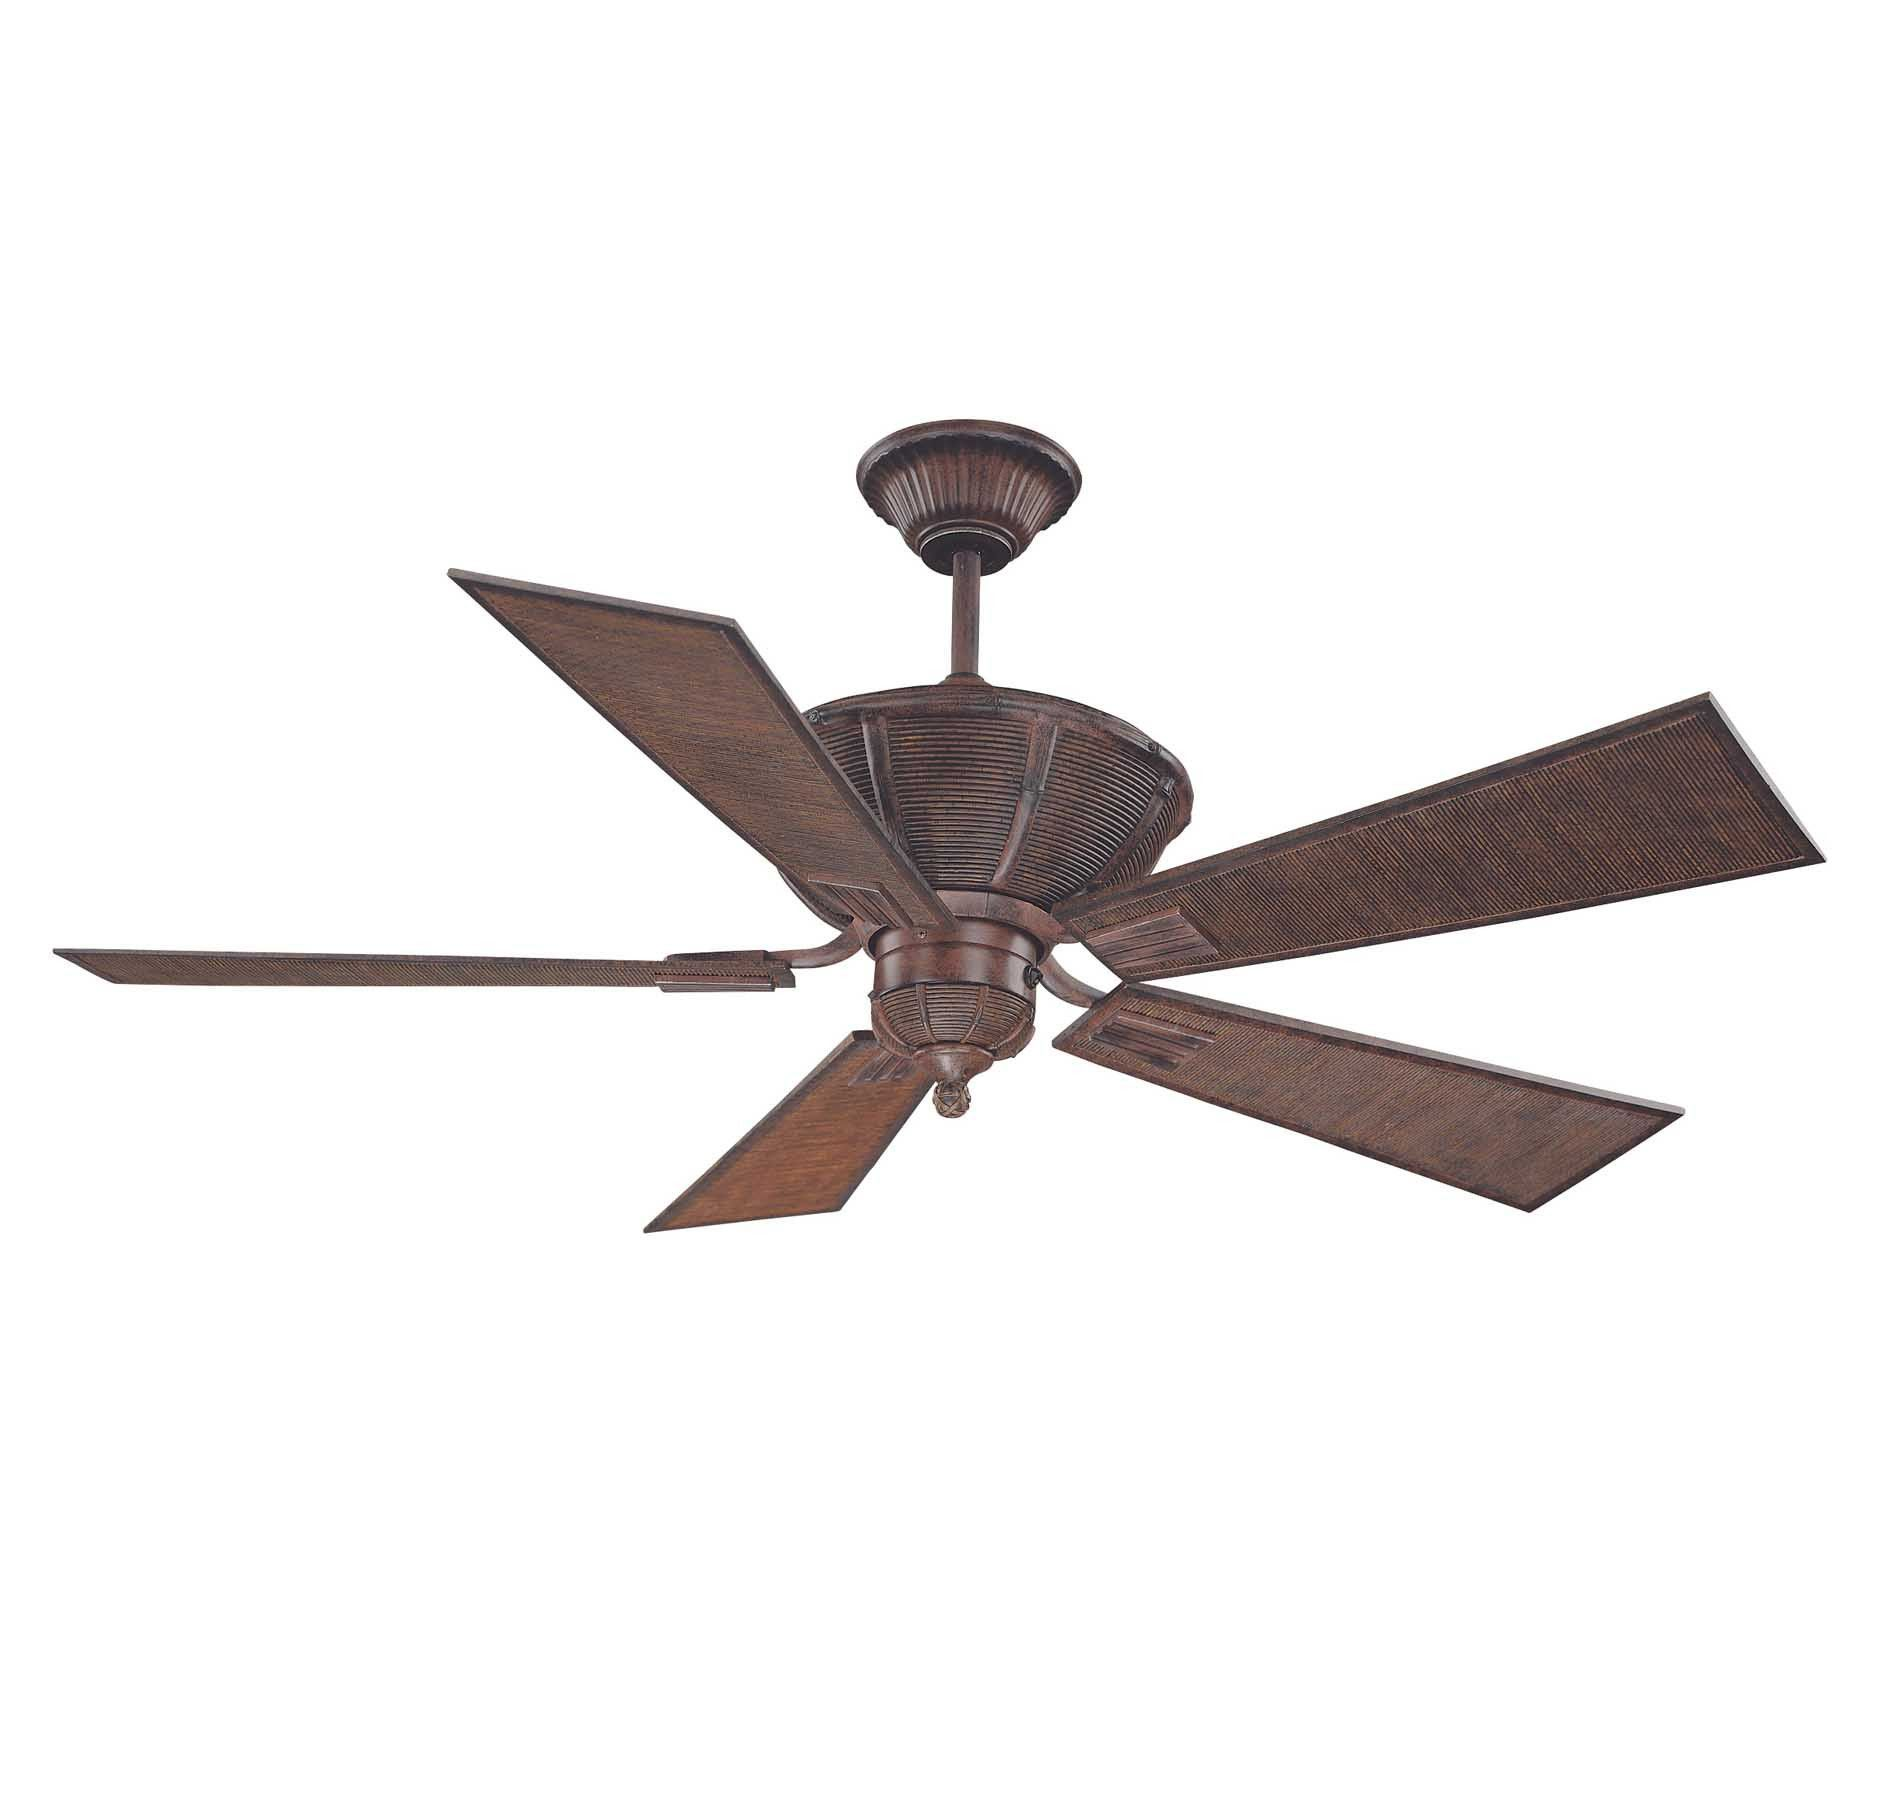 Savoy Danville Ceiling Fan Products Pinterest